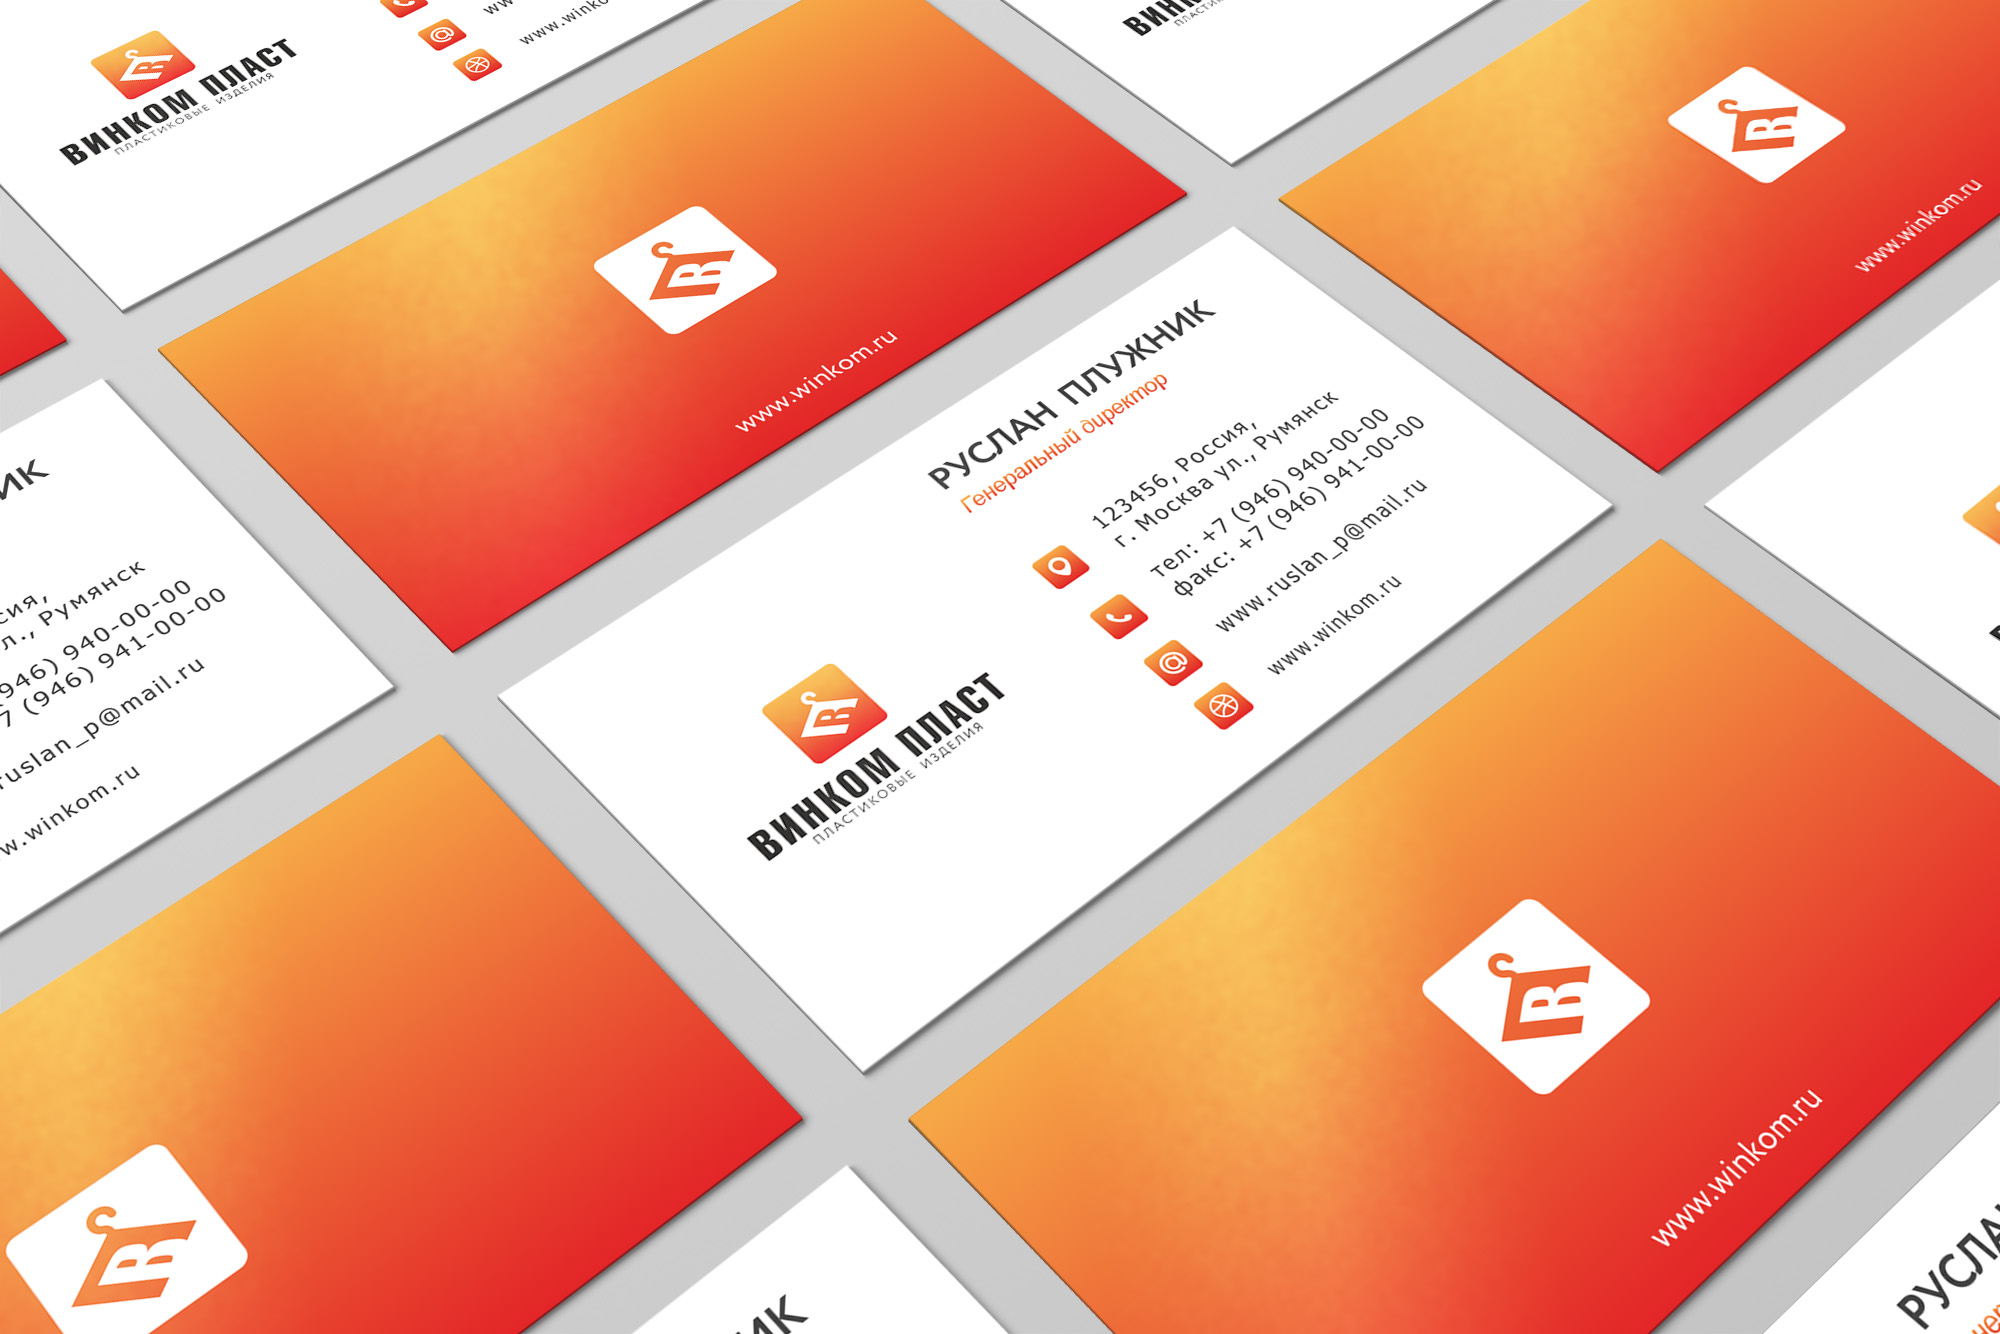 Логотип, фавикон и визитка для компании Винком Пласт  фото f_2205c3c0149257e4.jpg